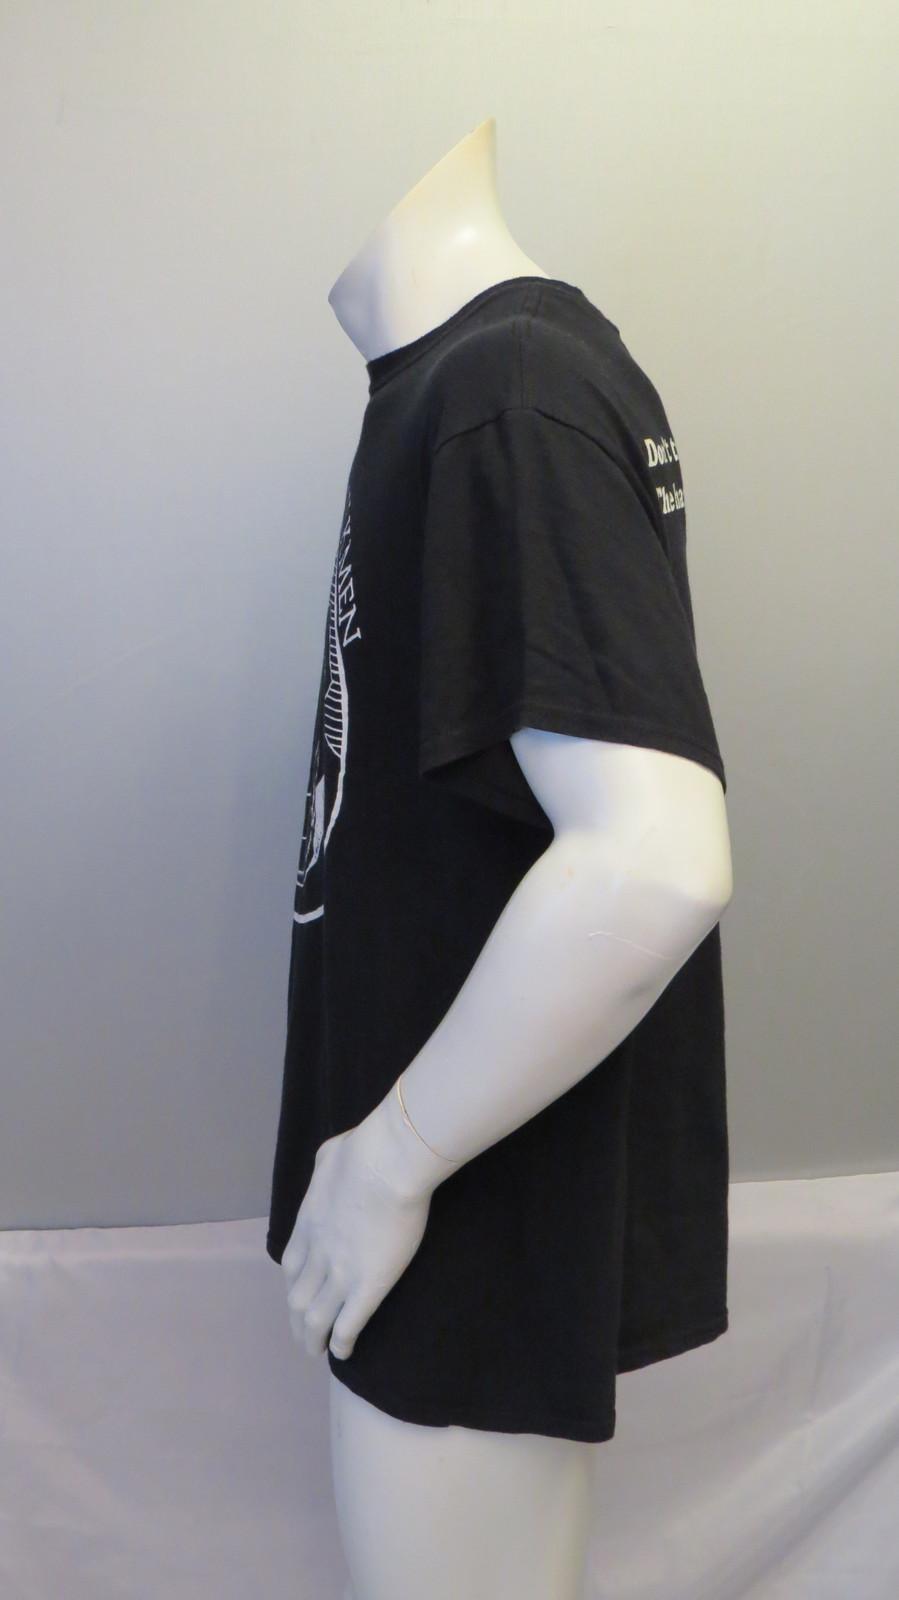 Dead Milkmen Shirt (Retro) - Don't Trust Happy People - Men's Large